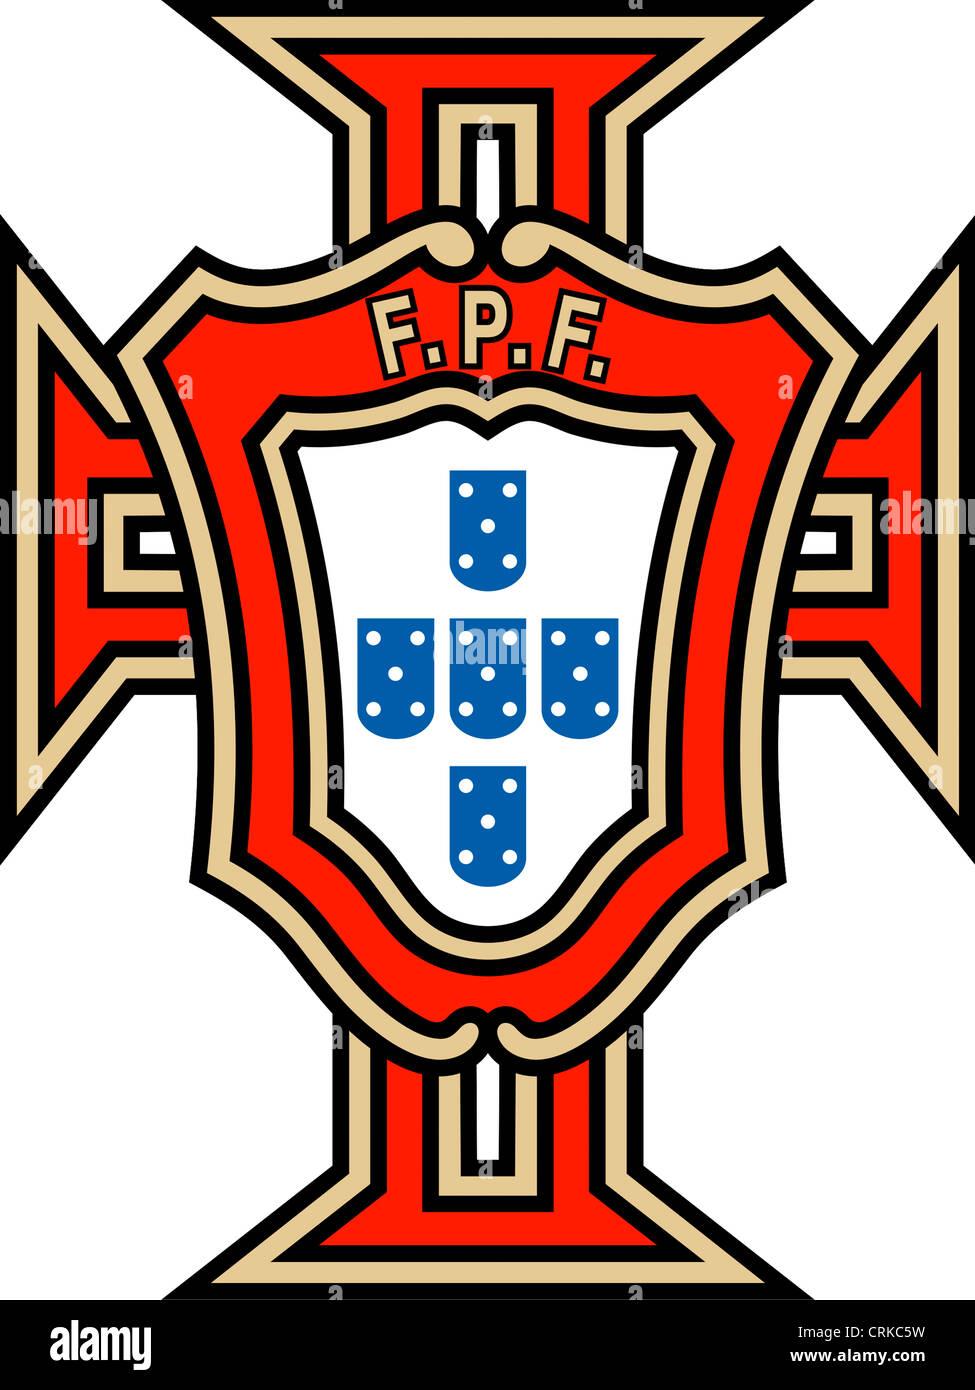 Image result for fpf logo